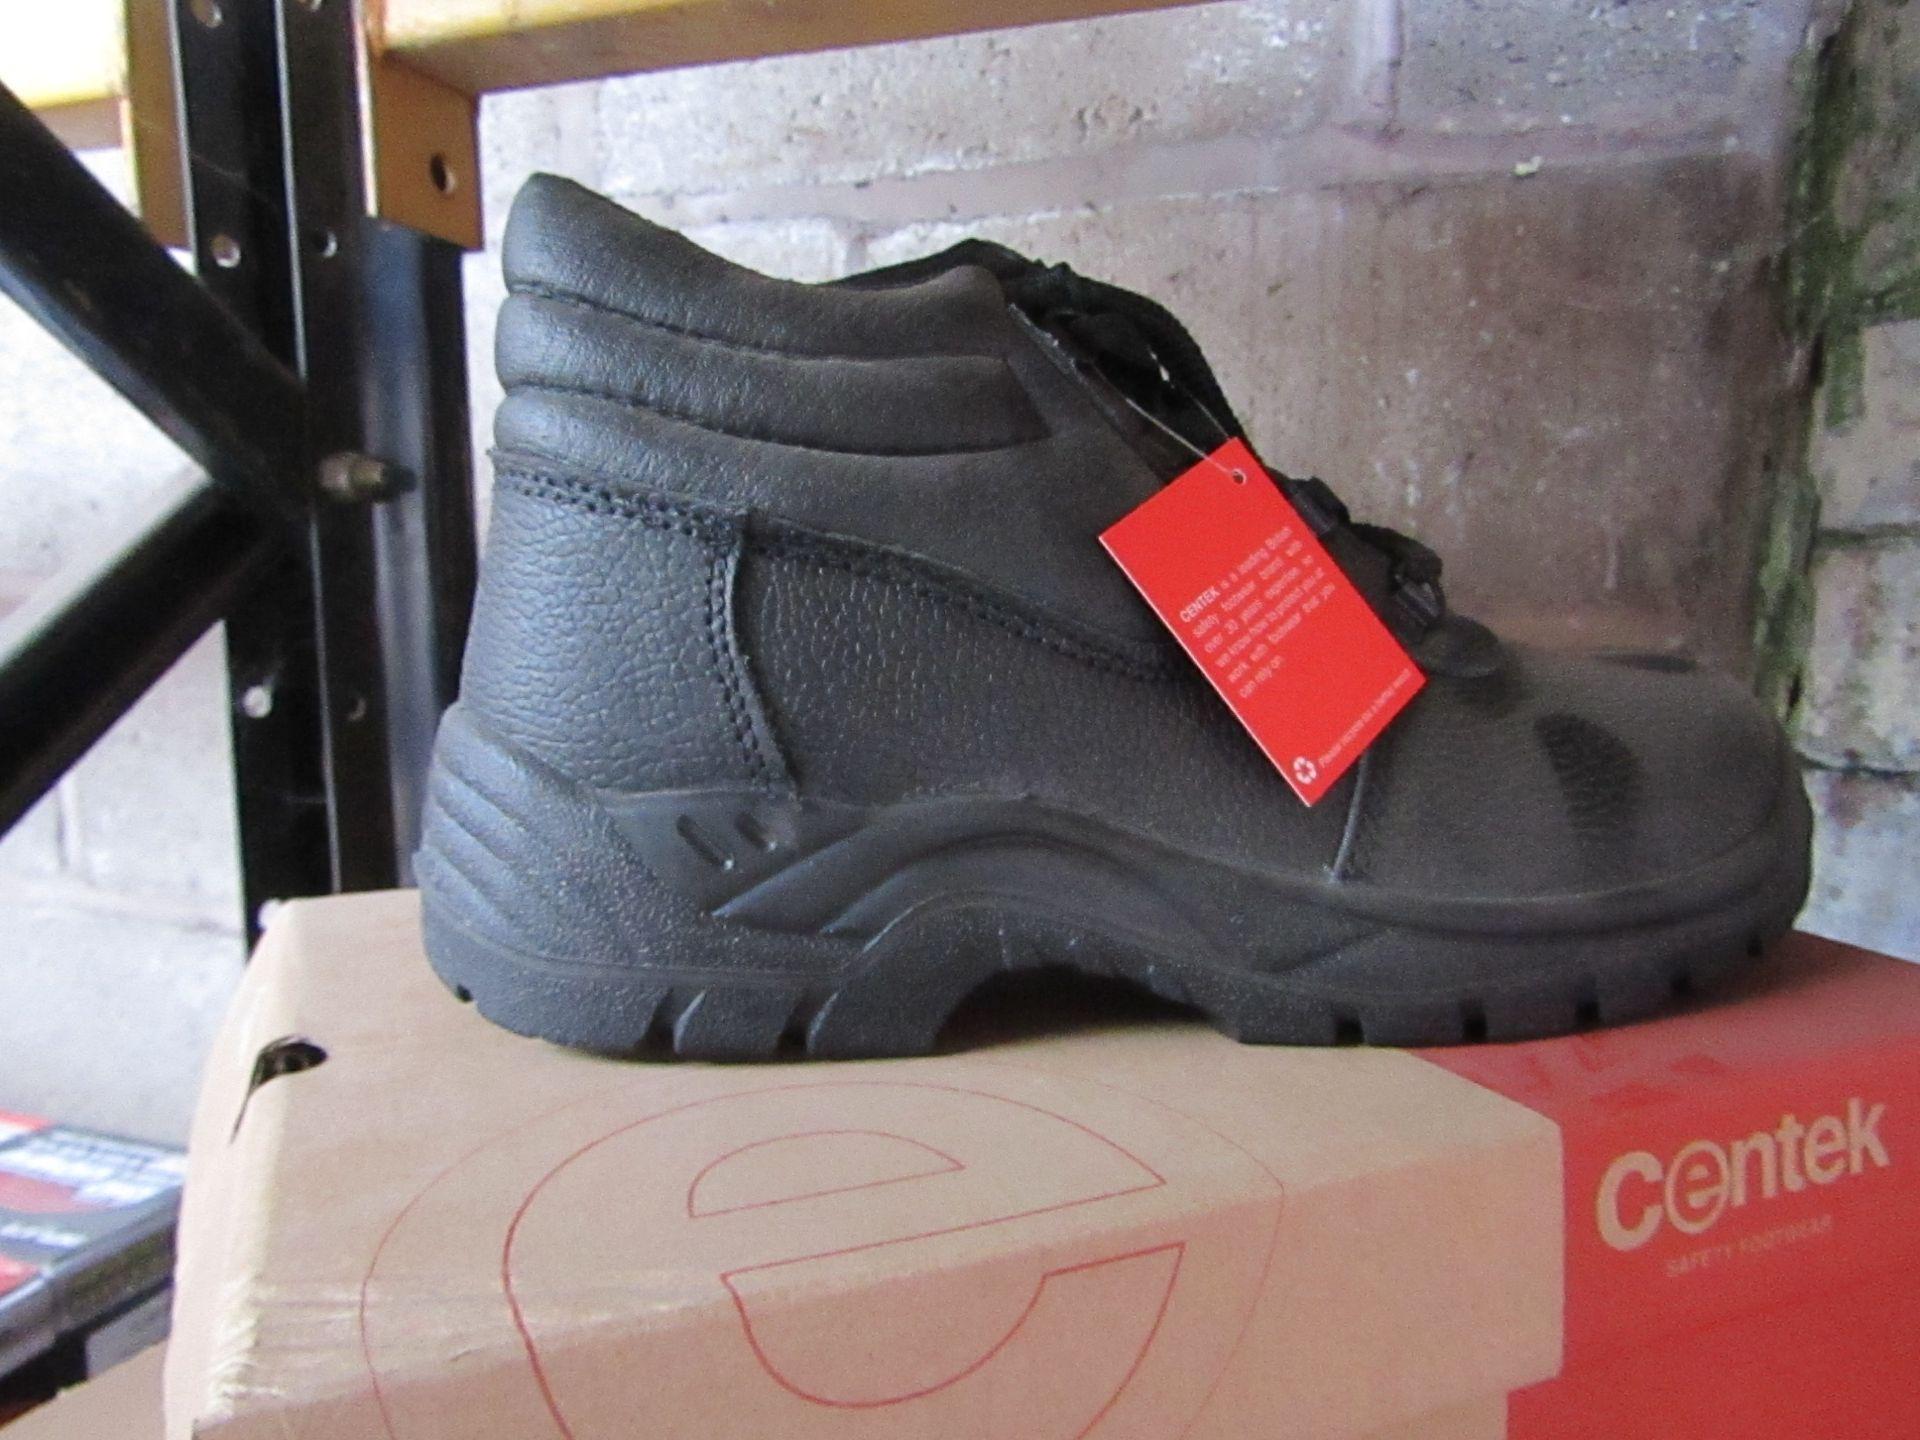 Lot 84 - Centek - Black Steel Toe Cap Boot - Size 9 - New & Boxed.